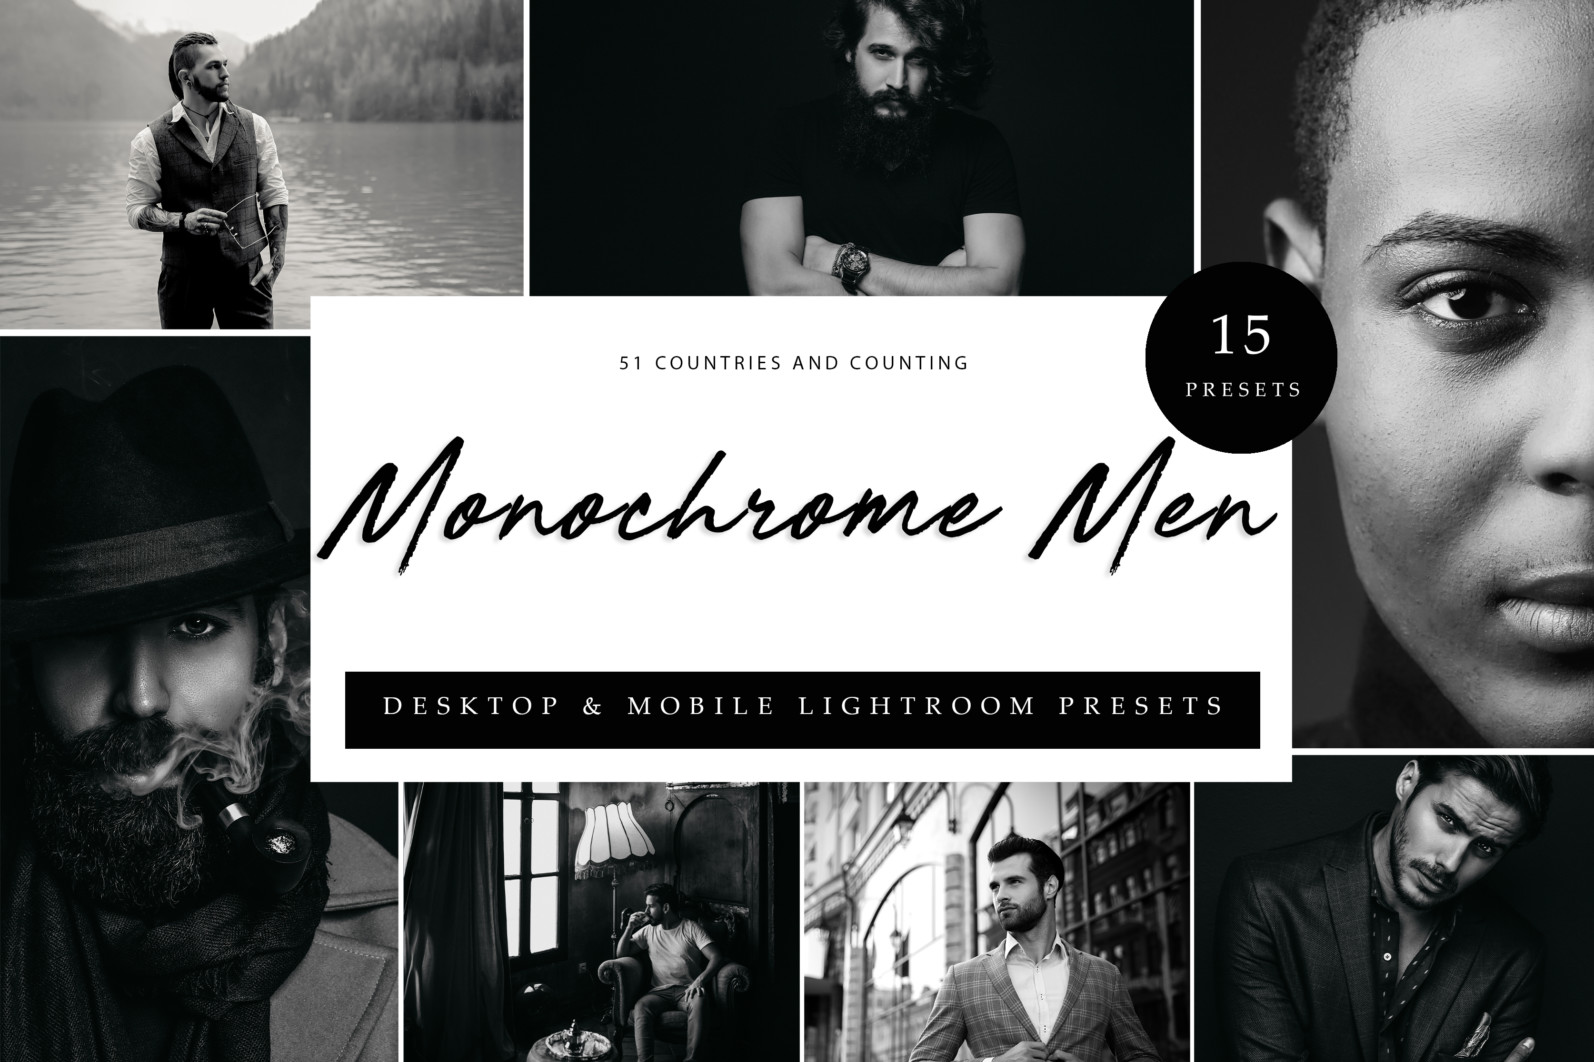 15 x Lightroom Presets, Monochrome Men Presets, Black and White Presets, Portrait Presets - Cover Monochrome Men scaled -